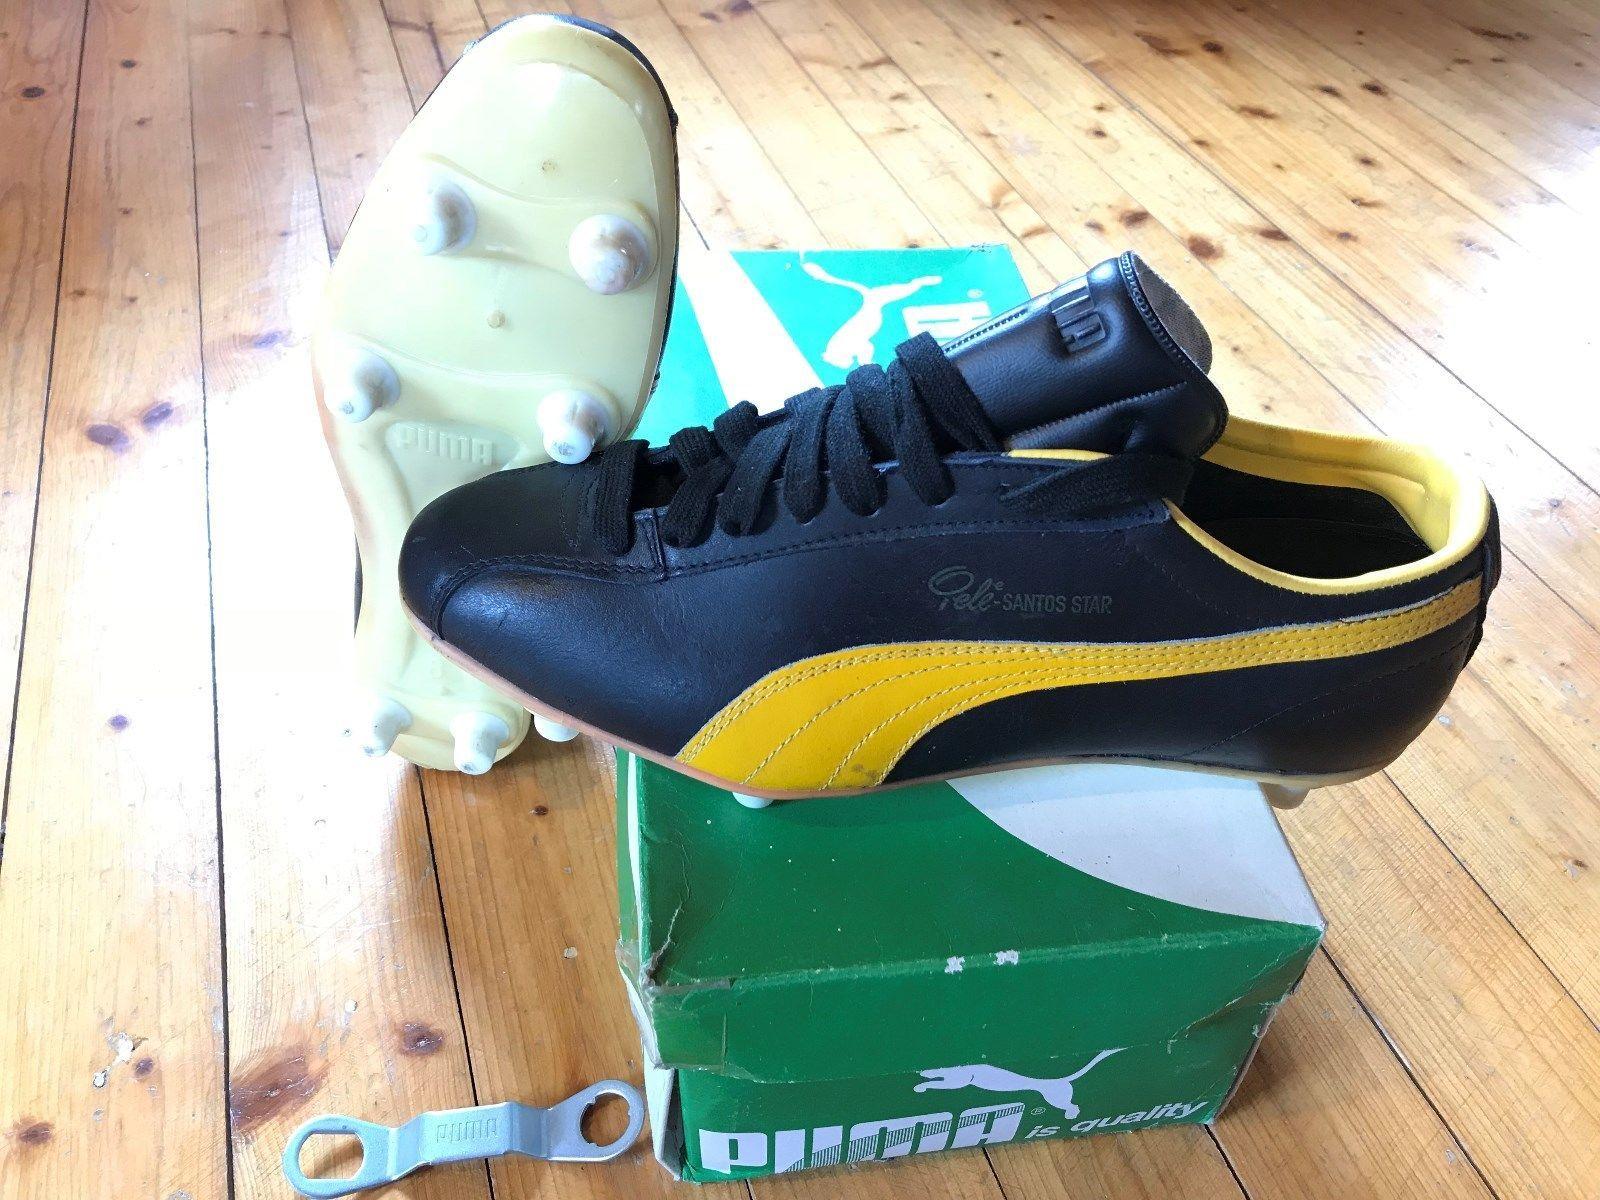 6d7c0cf11 Vintage Puma Pele Santos soccer boots UK 8 Made in West Germany/ Maradona  King | eBay